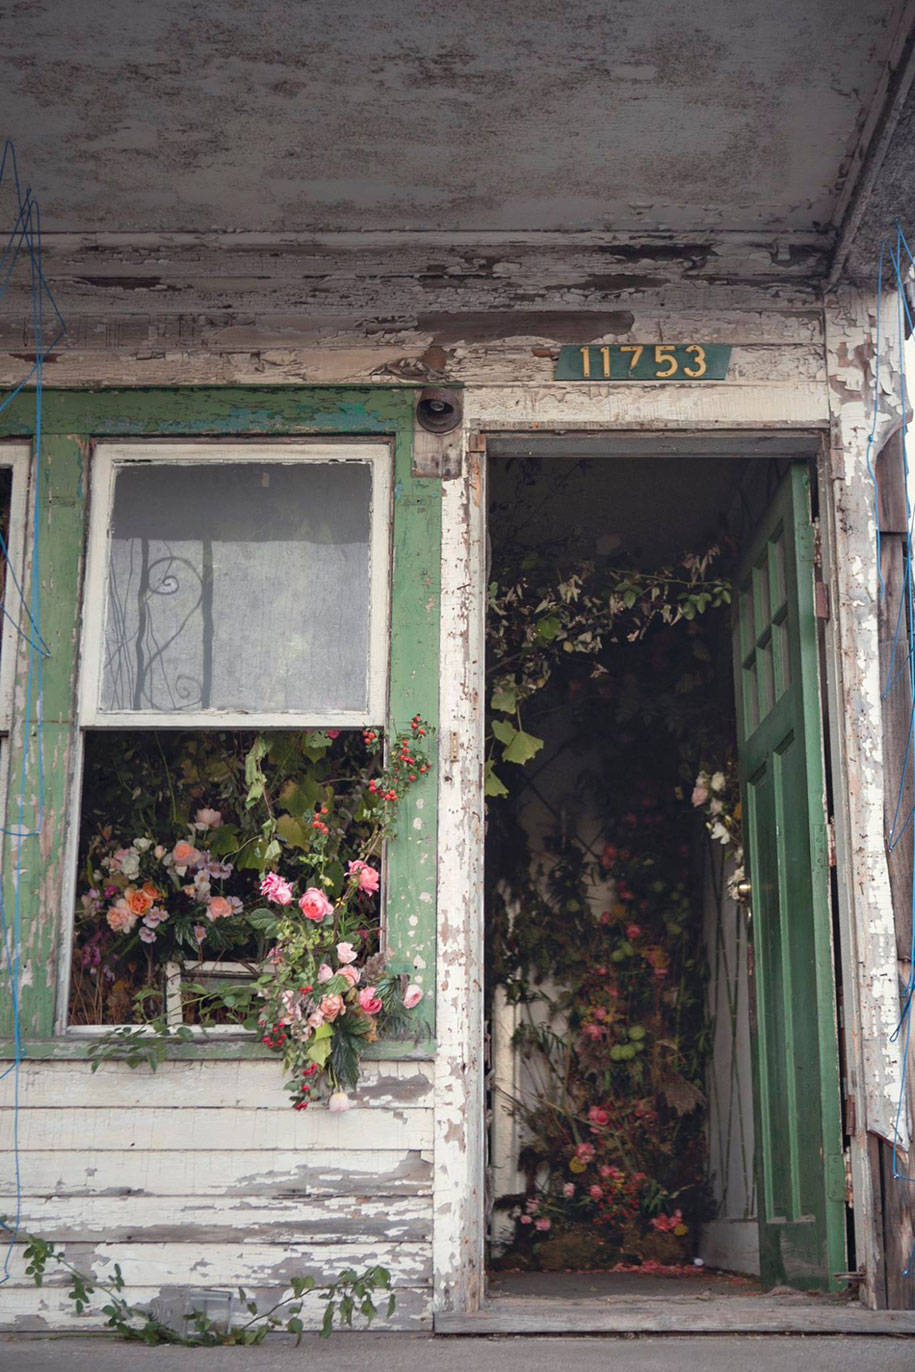 abandoned-house-transformed-flower-house-lisa-waud-heather-saunders-31